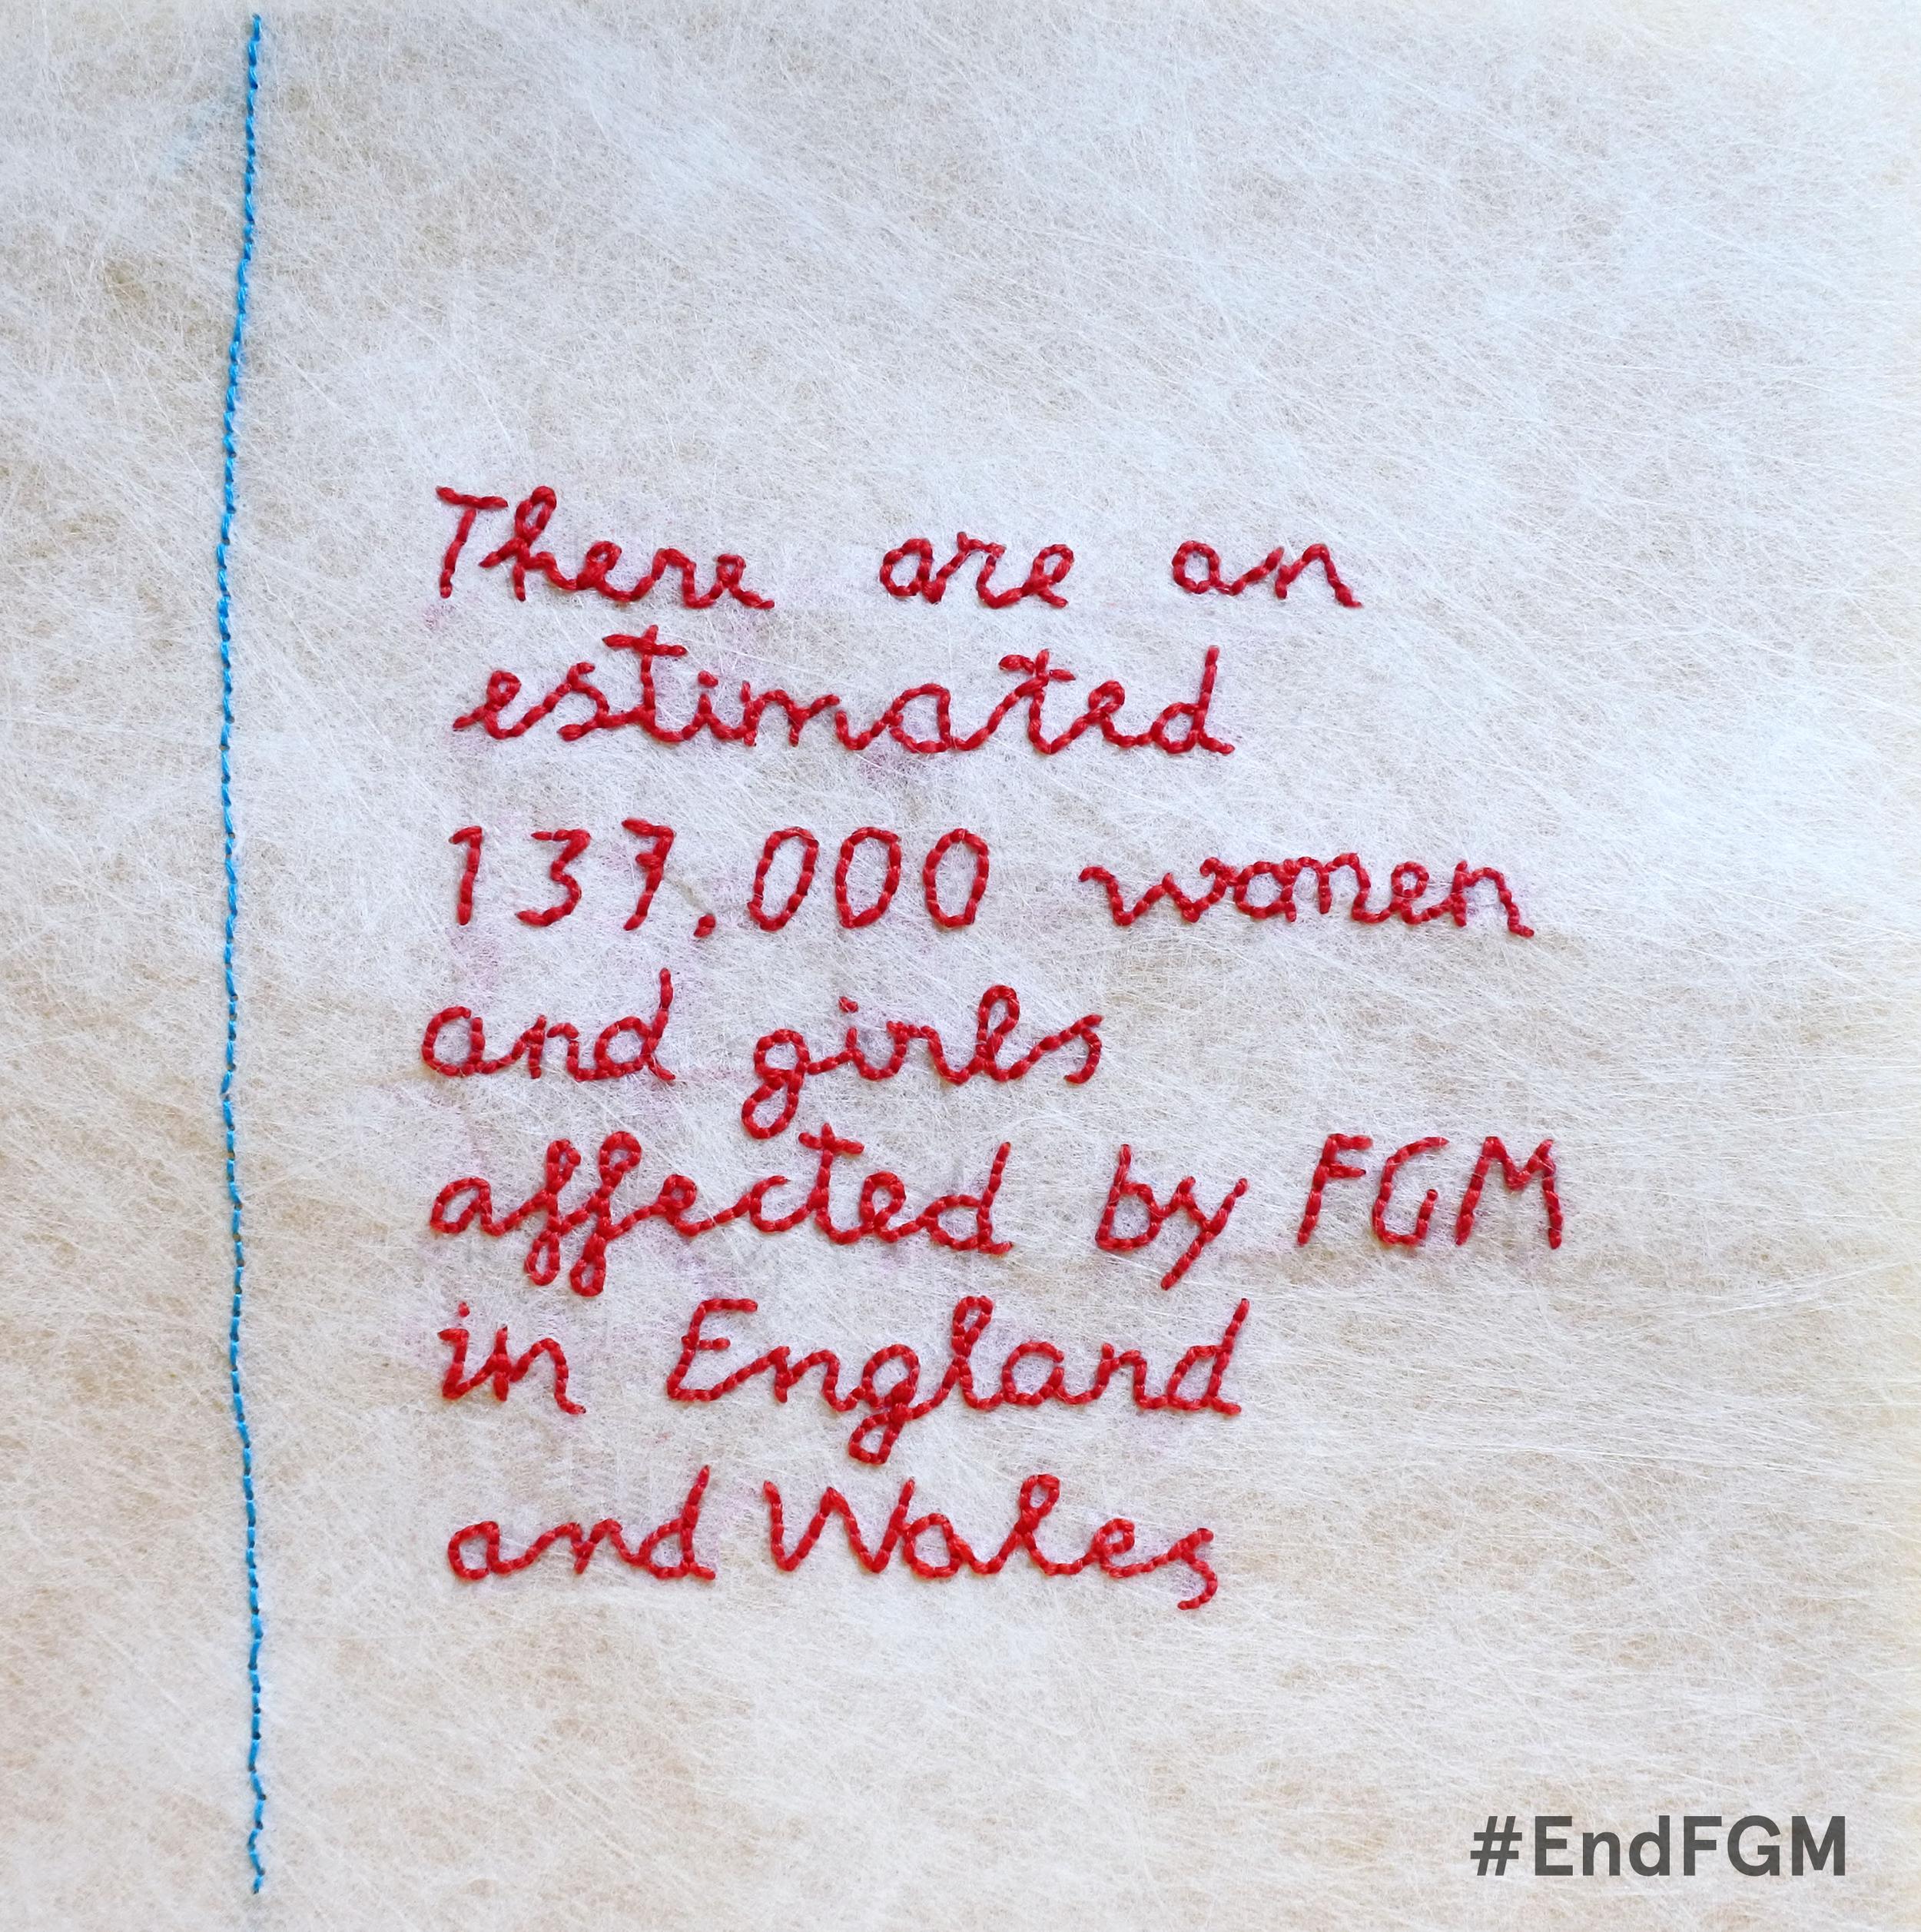 FGM Image1 Watermark.png